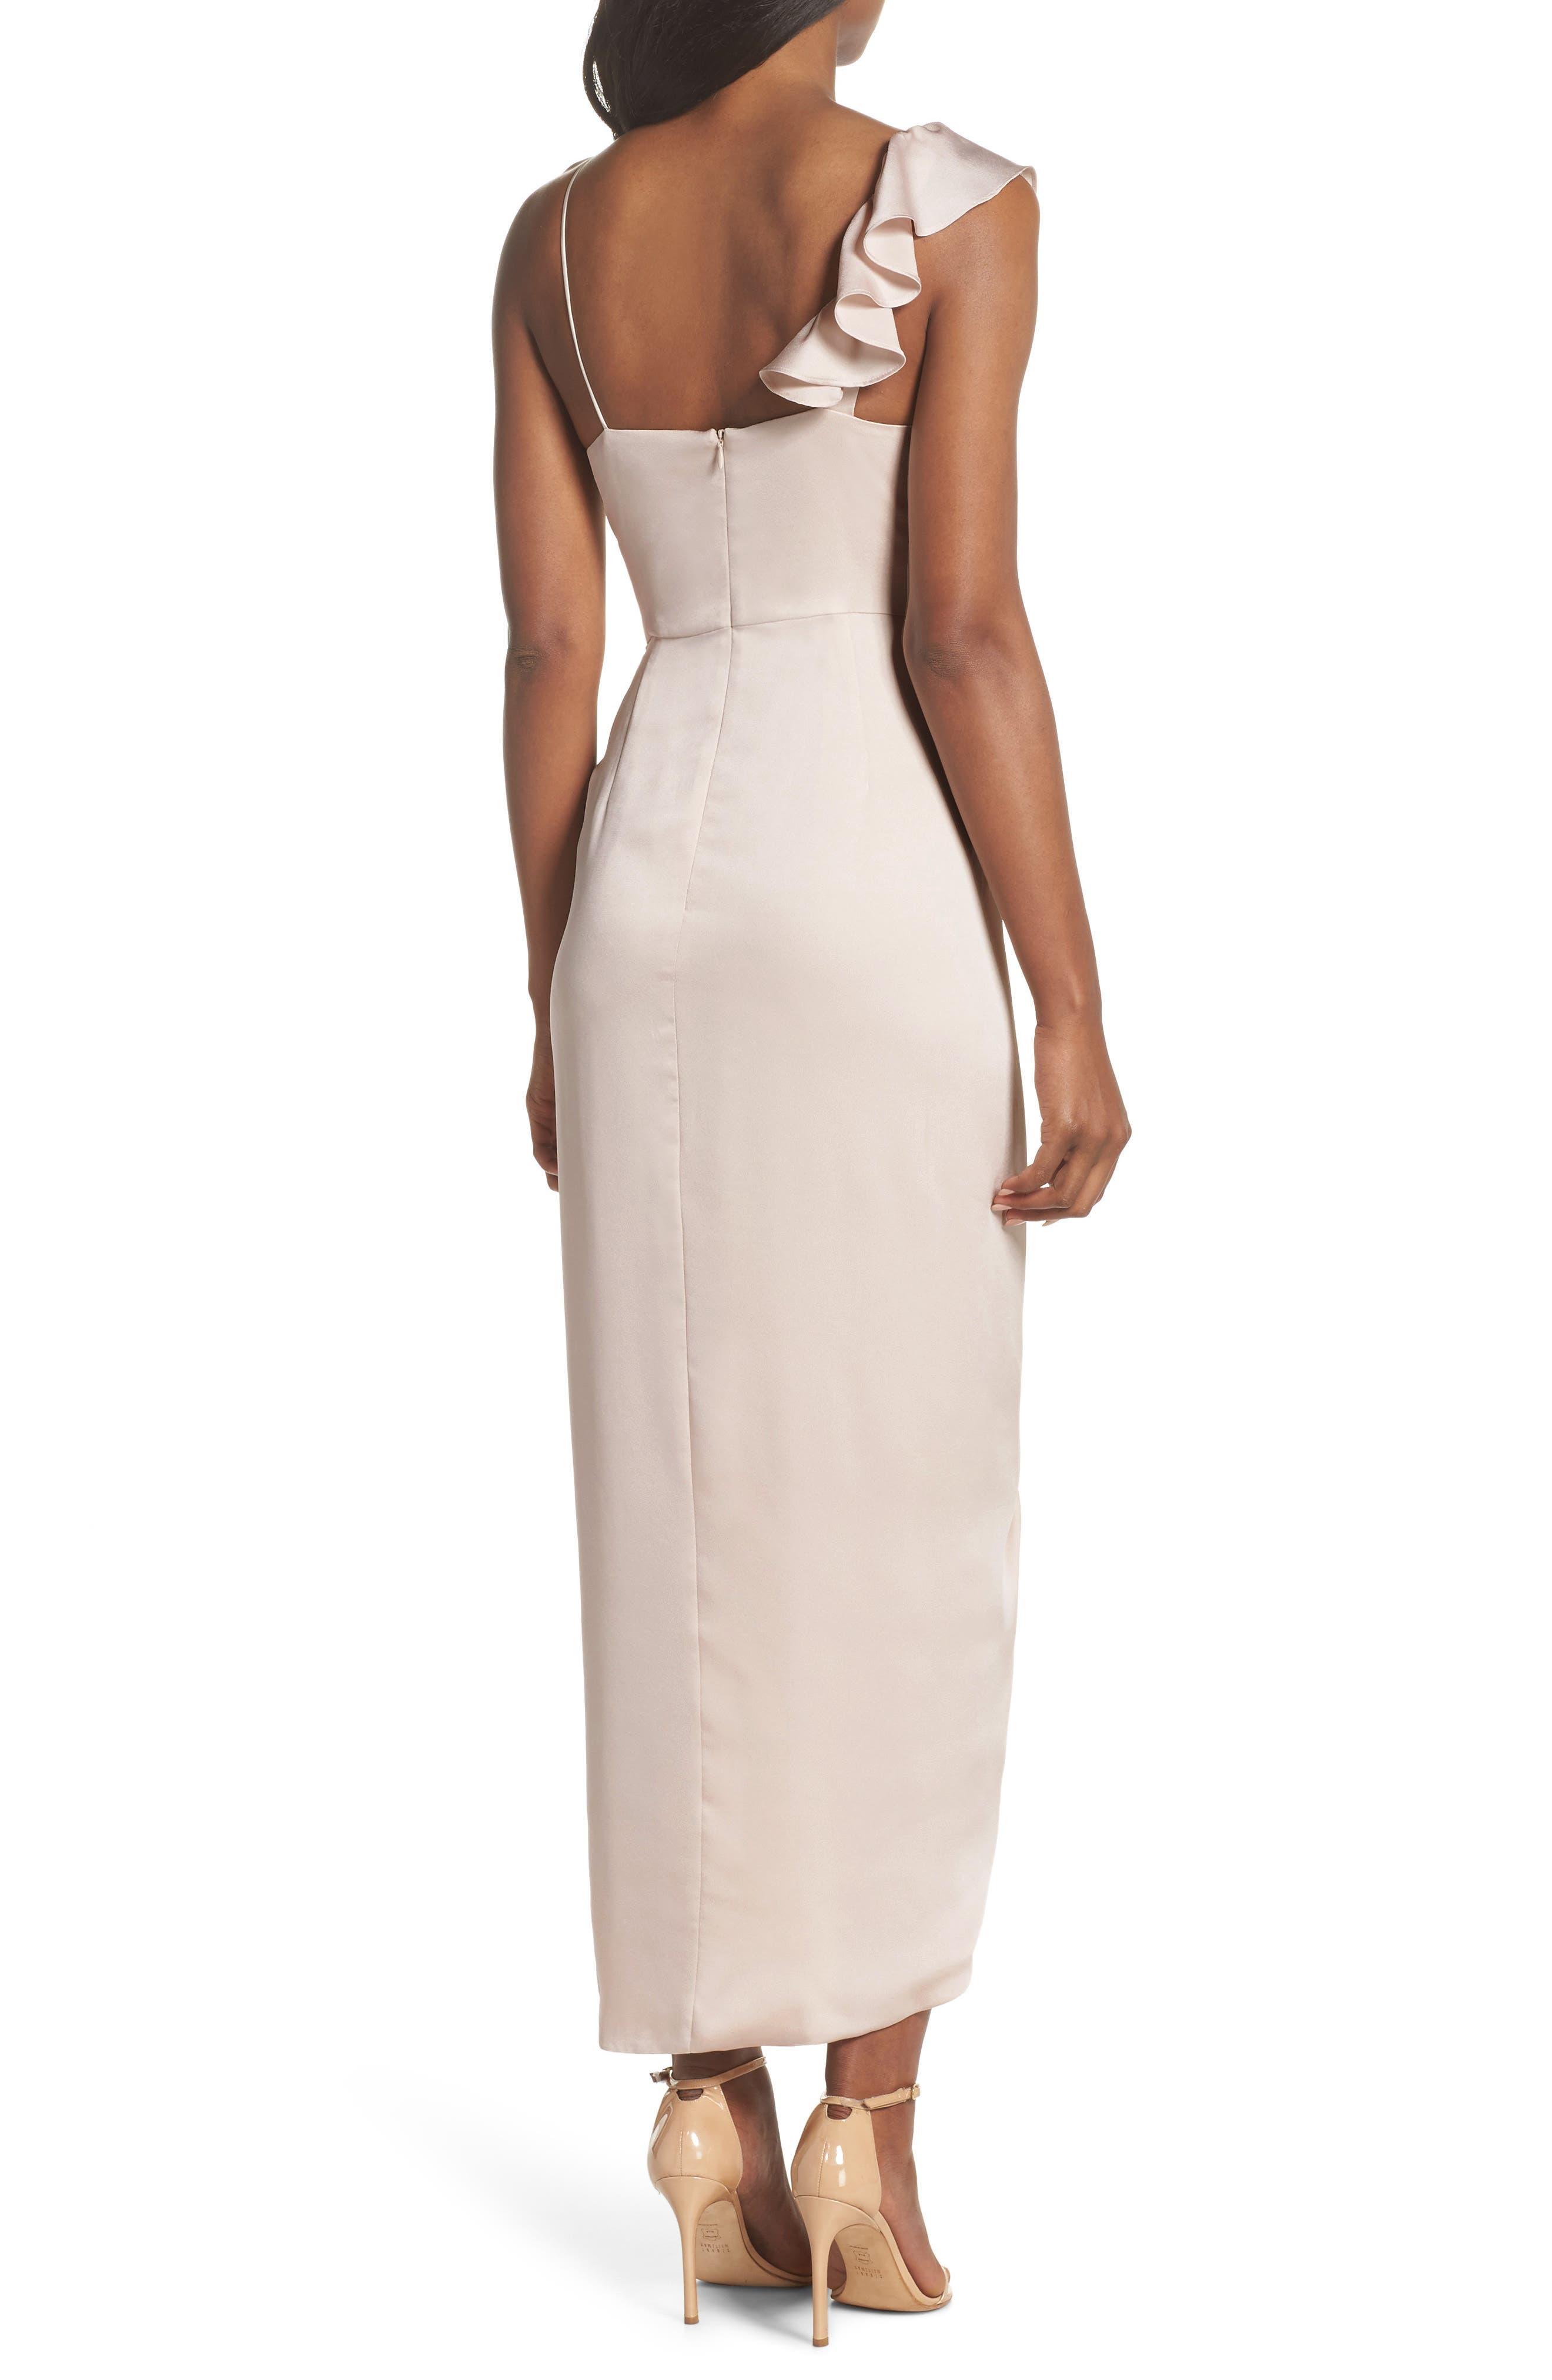 Luxe Asymmetrical Frill Maxi Dress,                             Alternate thumbnail 8, color,                             Porcelain